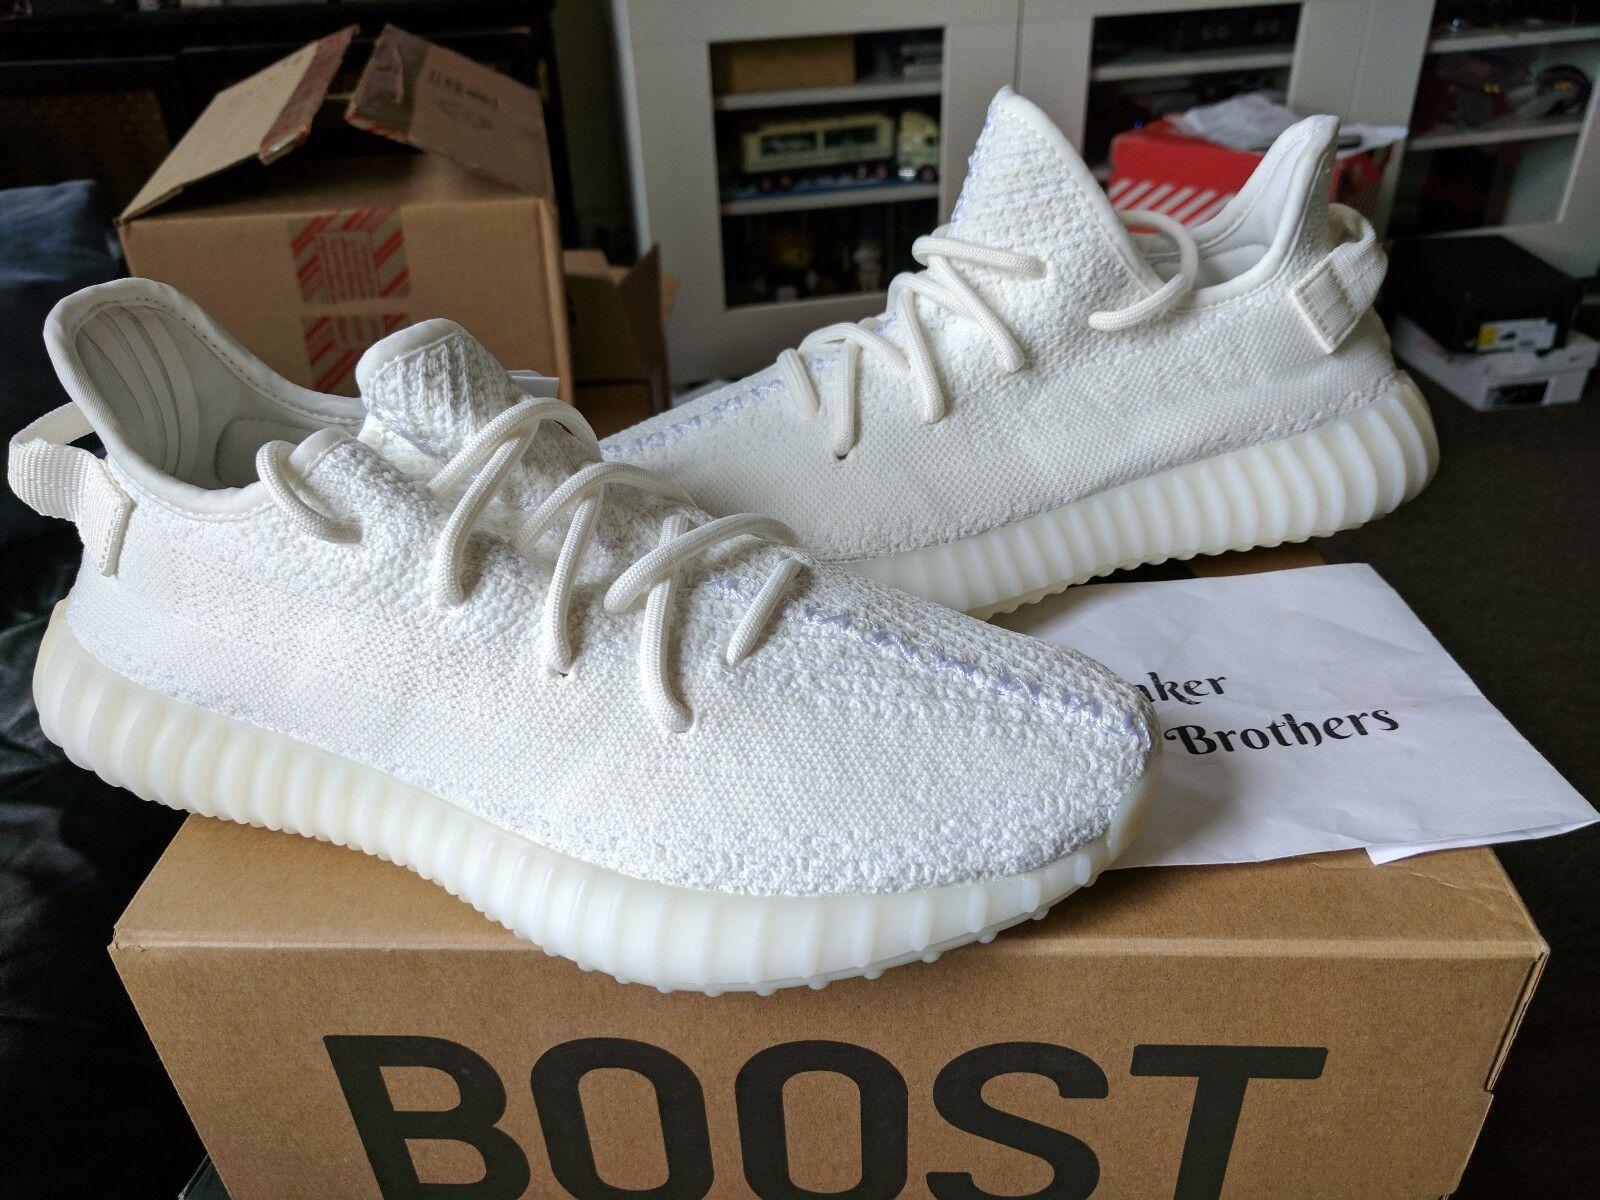 Adidas Yeezy Boost 350 V2 Cream Triple White Core SPLY Kanye West CP9366 Zebra